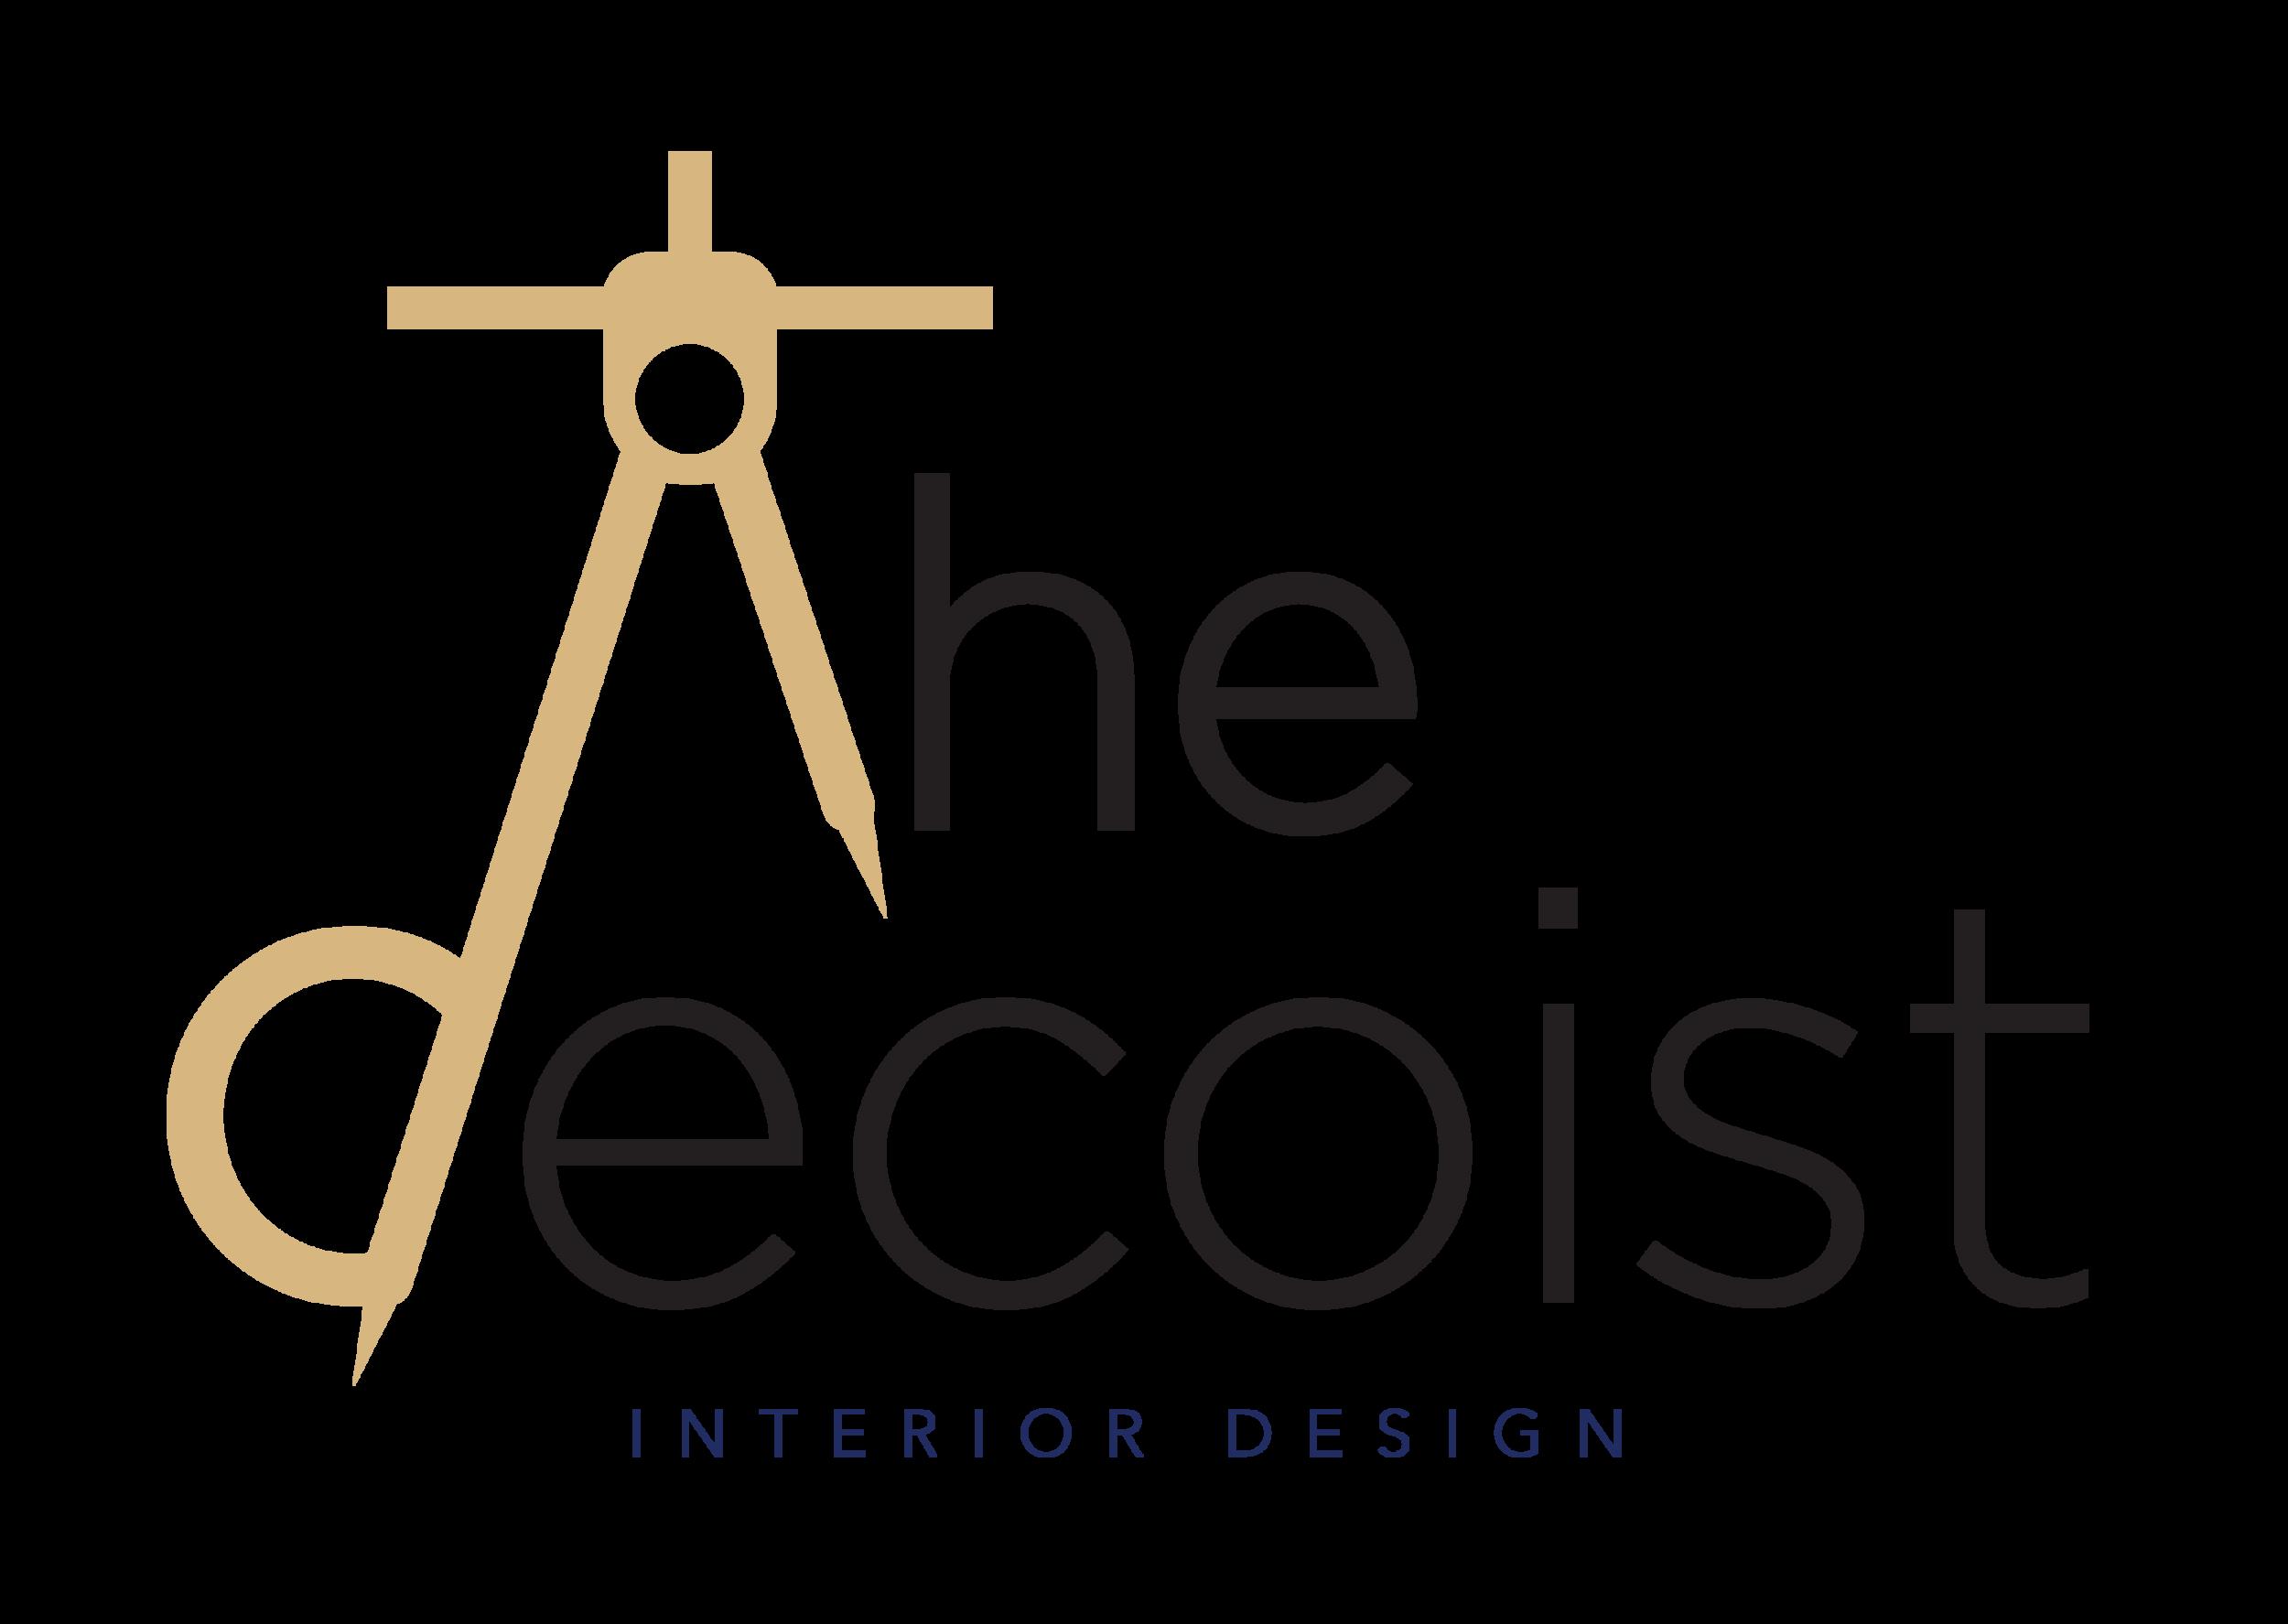 Logo-The-Decoist-01.png